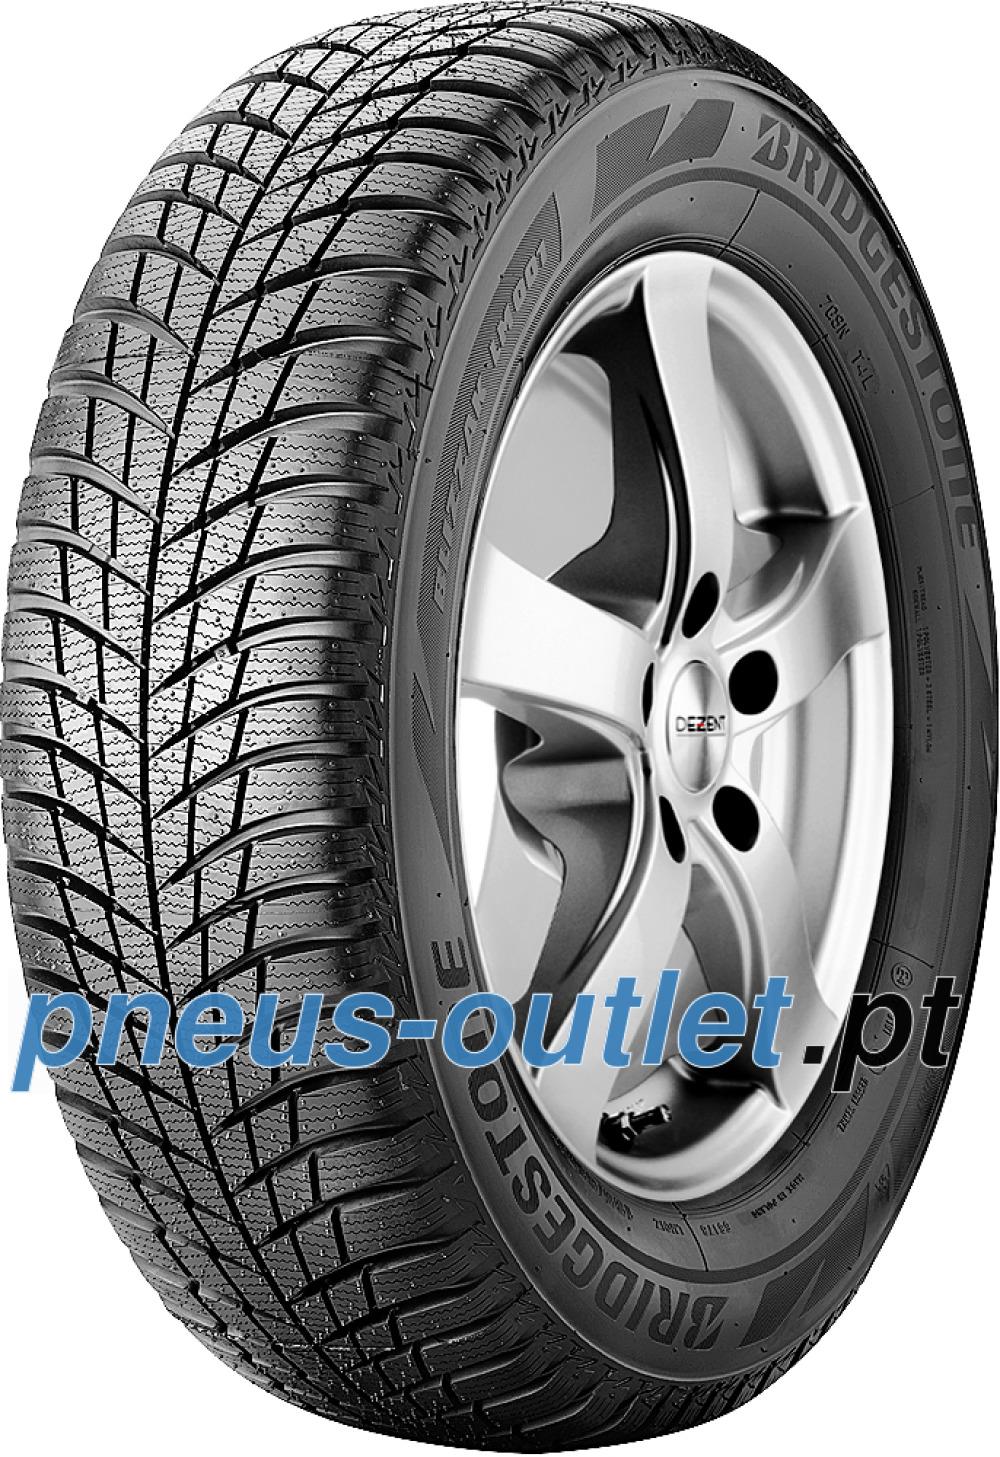 Bridgestone Blizzak LM 001 ( 185/65 R15 92T XL )